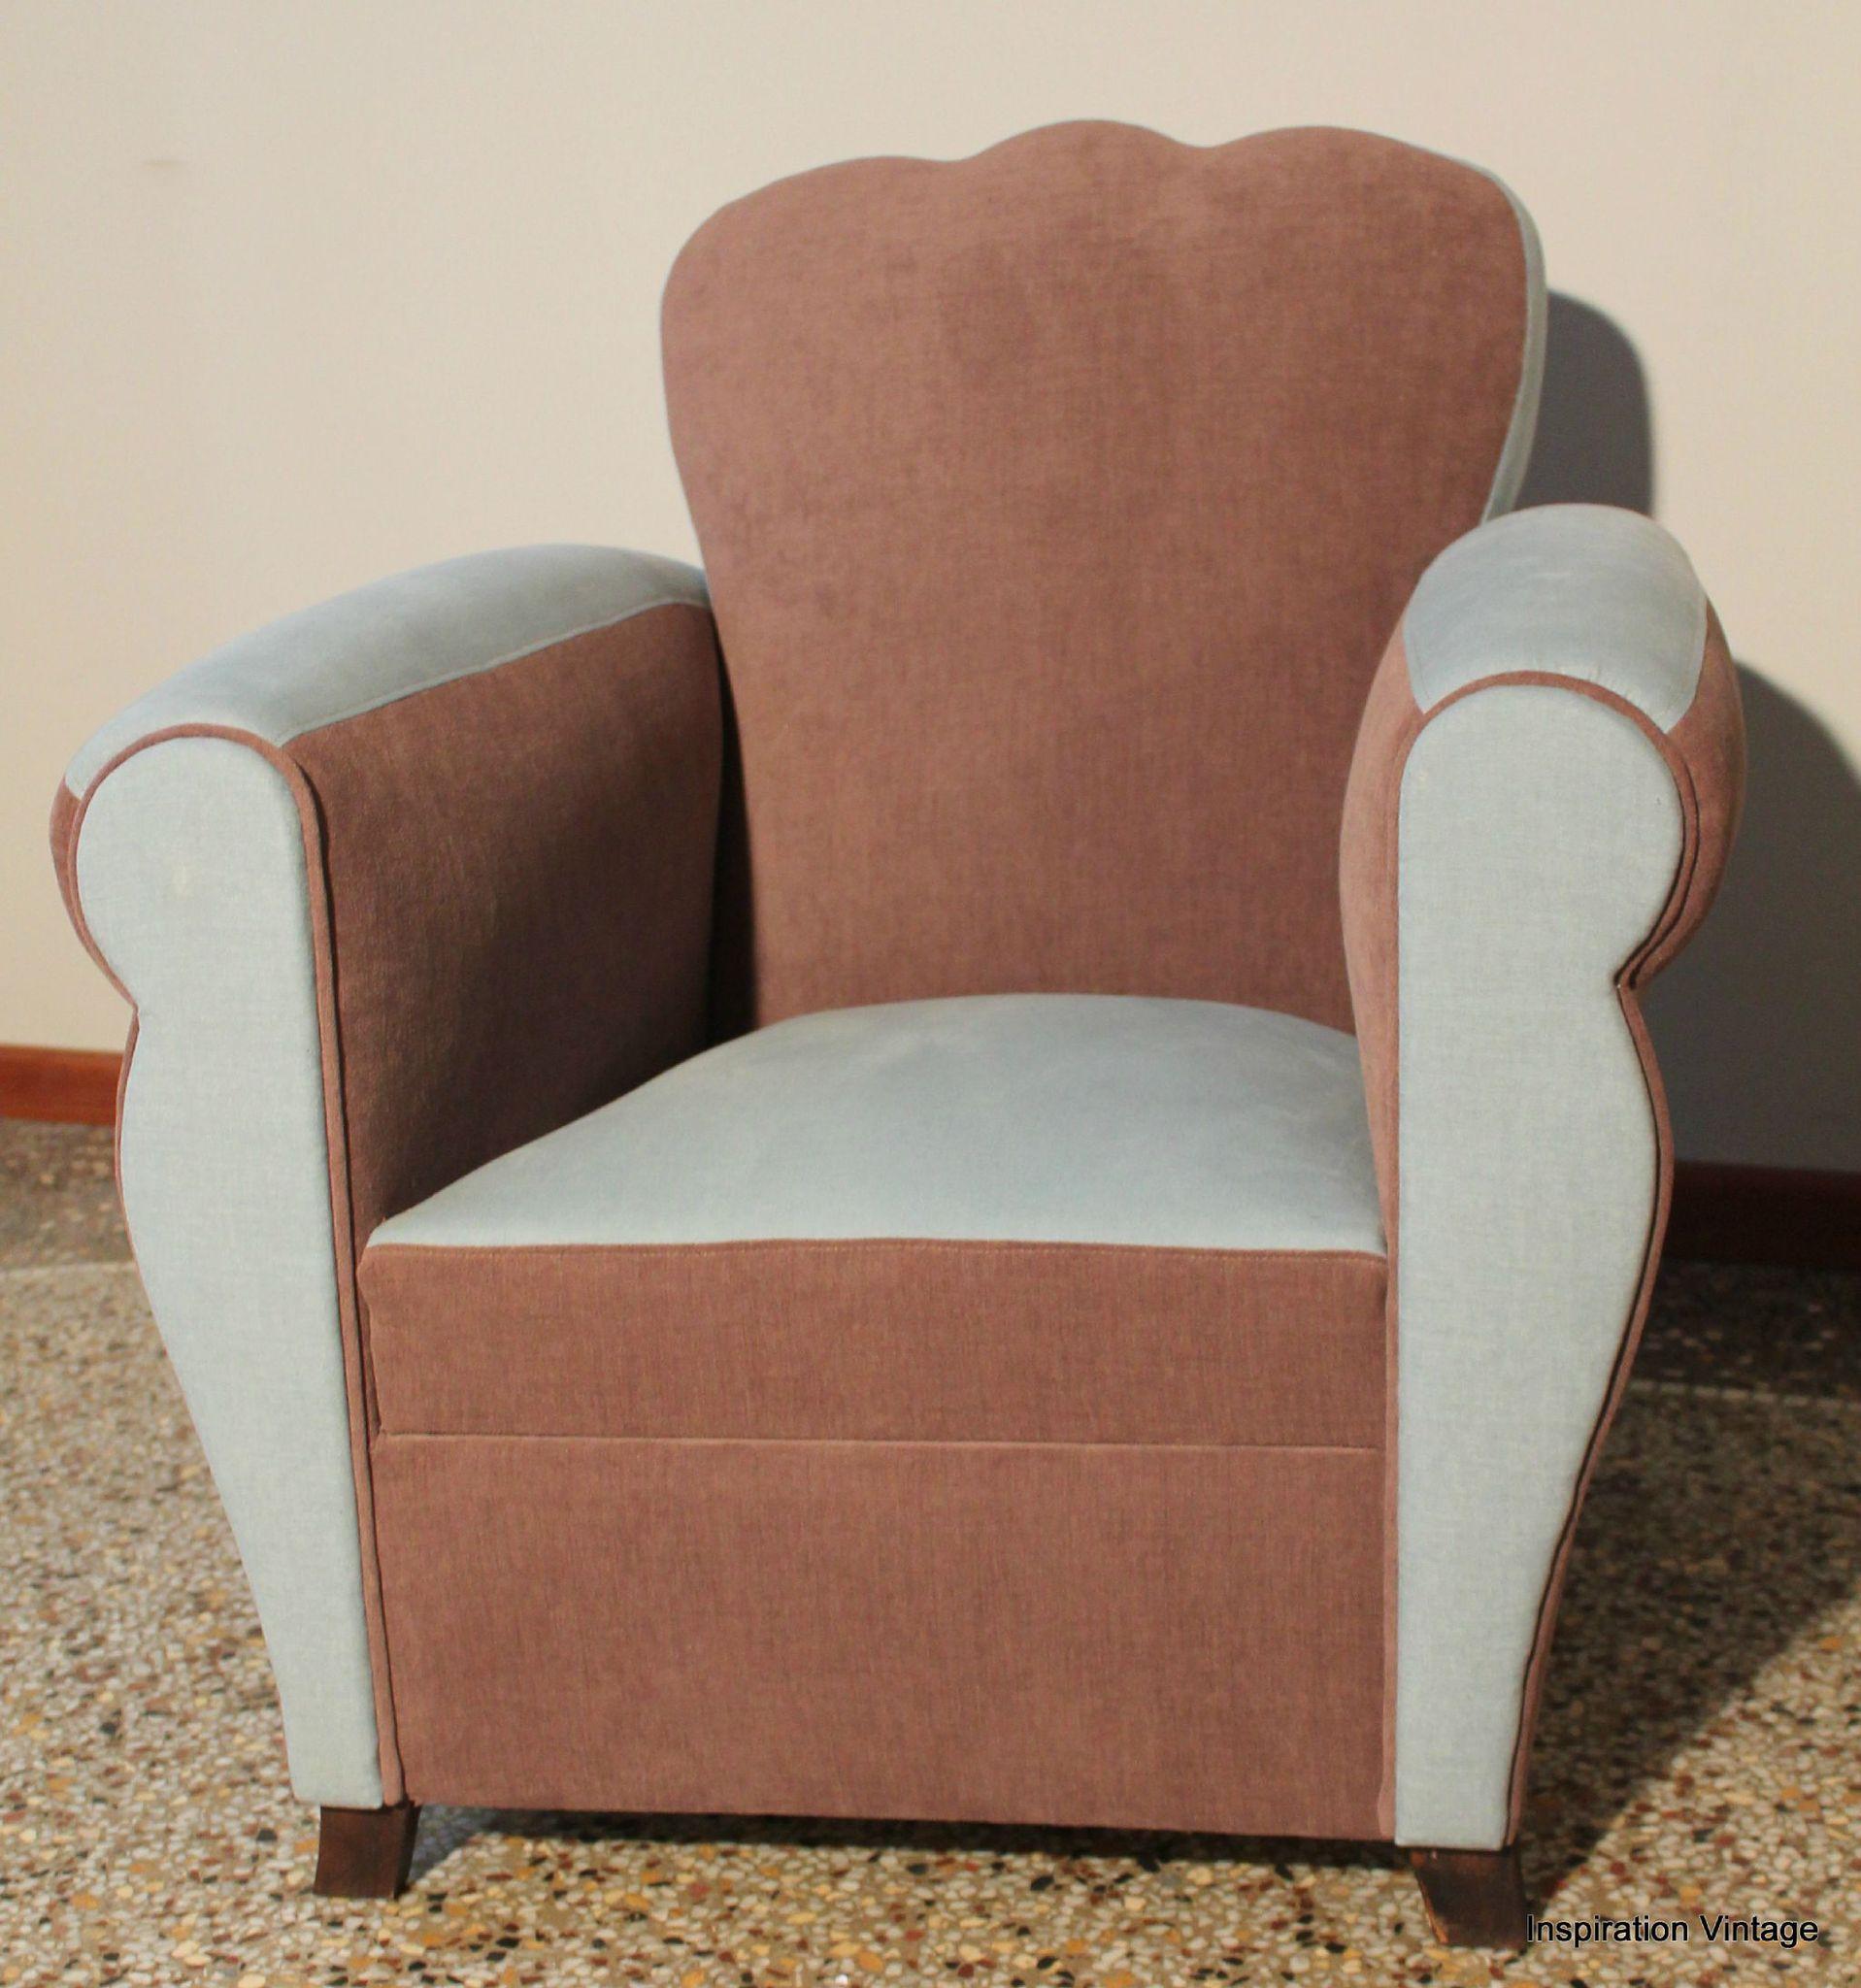 fauteuil club 50 39 s bleu chocolat inspiration vintage. Black Bedroom Furniture Sets. Home Design Ideas